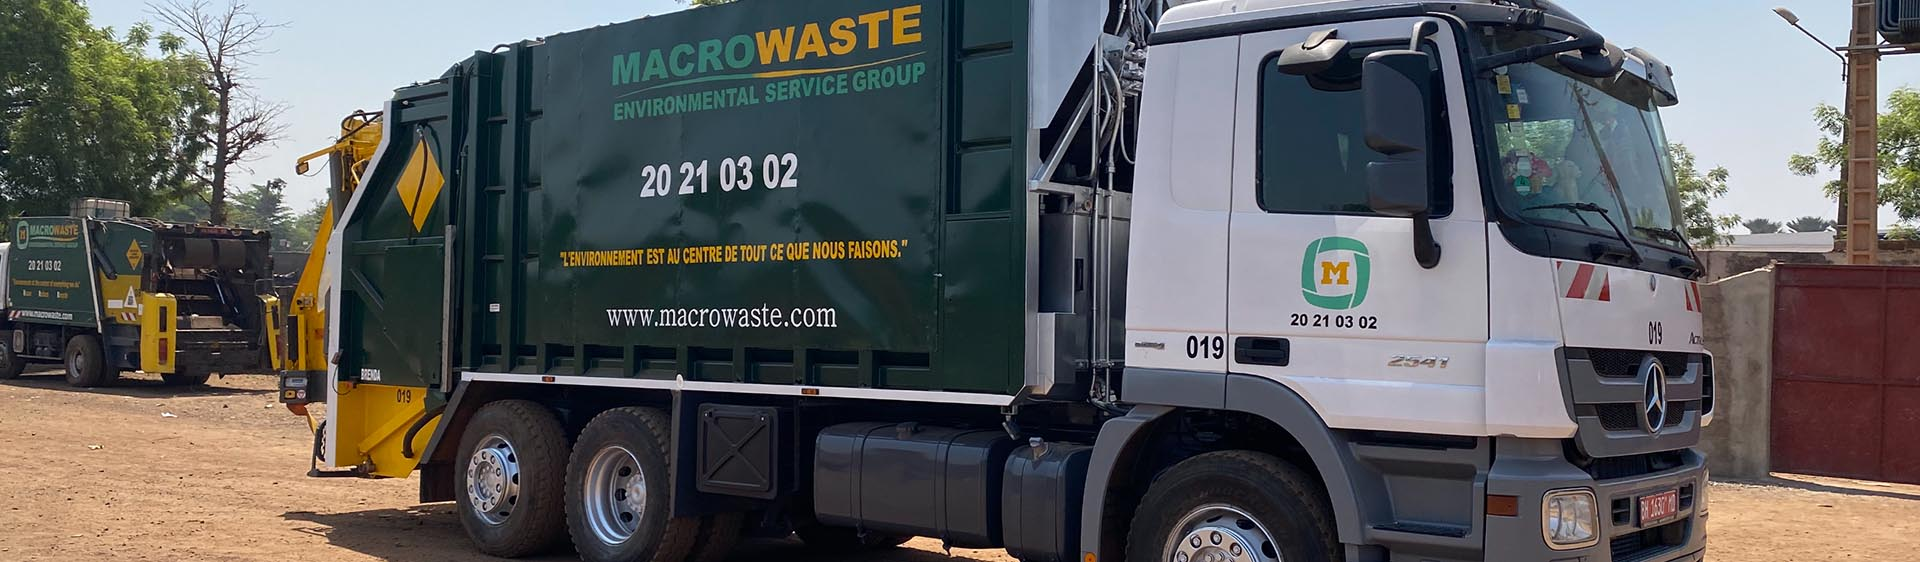 Philadelphia Waste Management